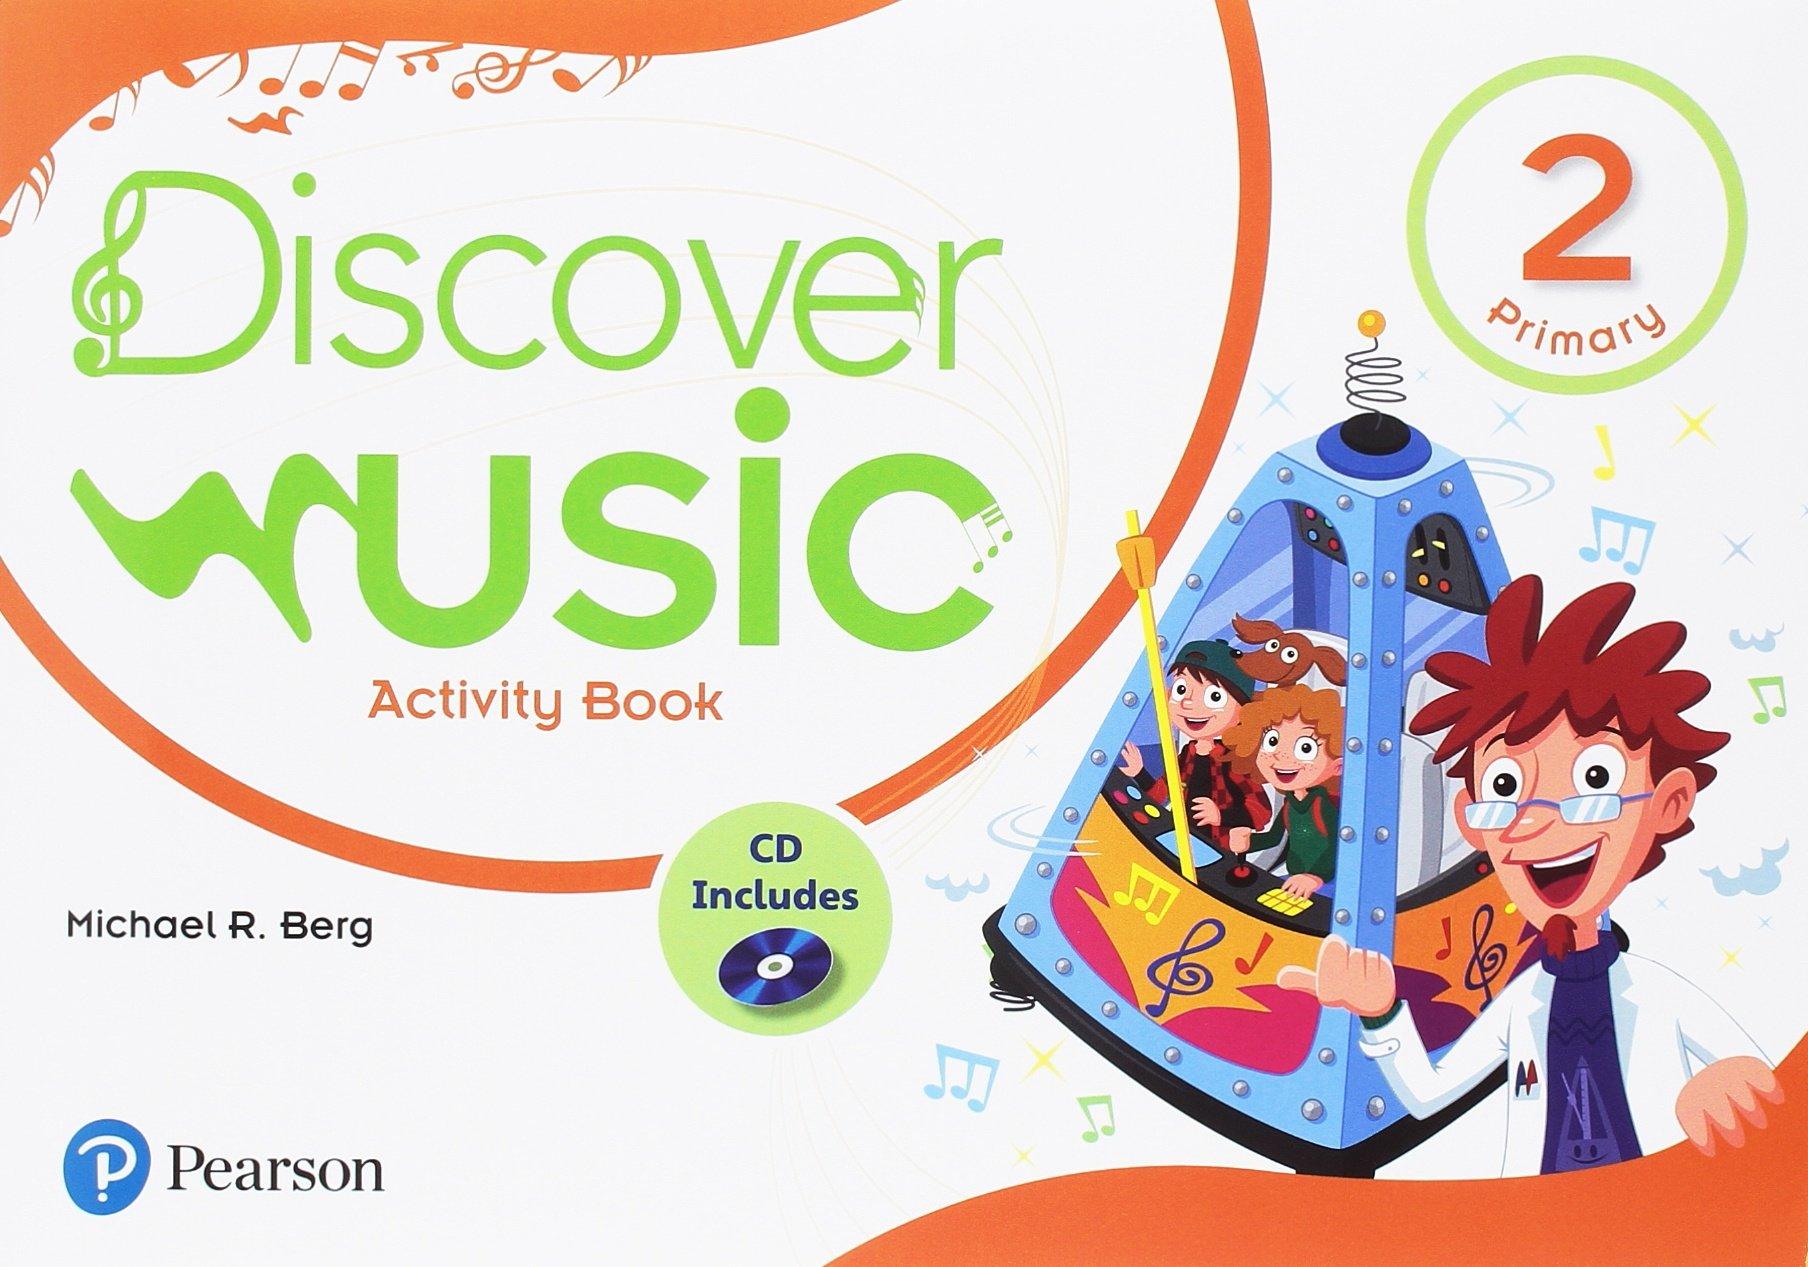 DISCOVER MUSIC 2 AB PACK: Amazon.es: Berg, Michael R.: Libros